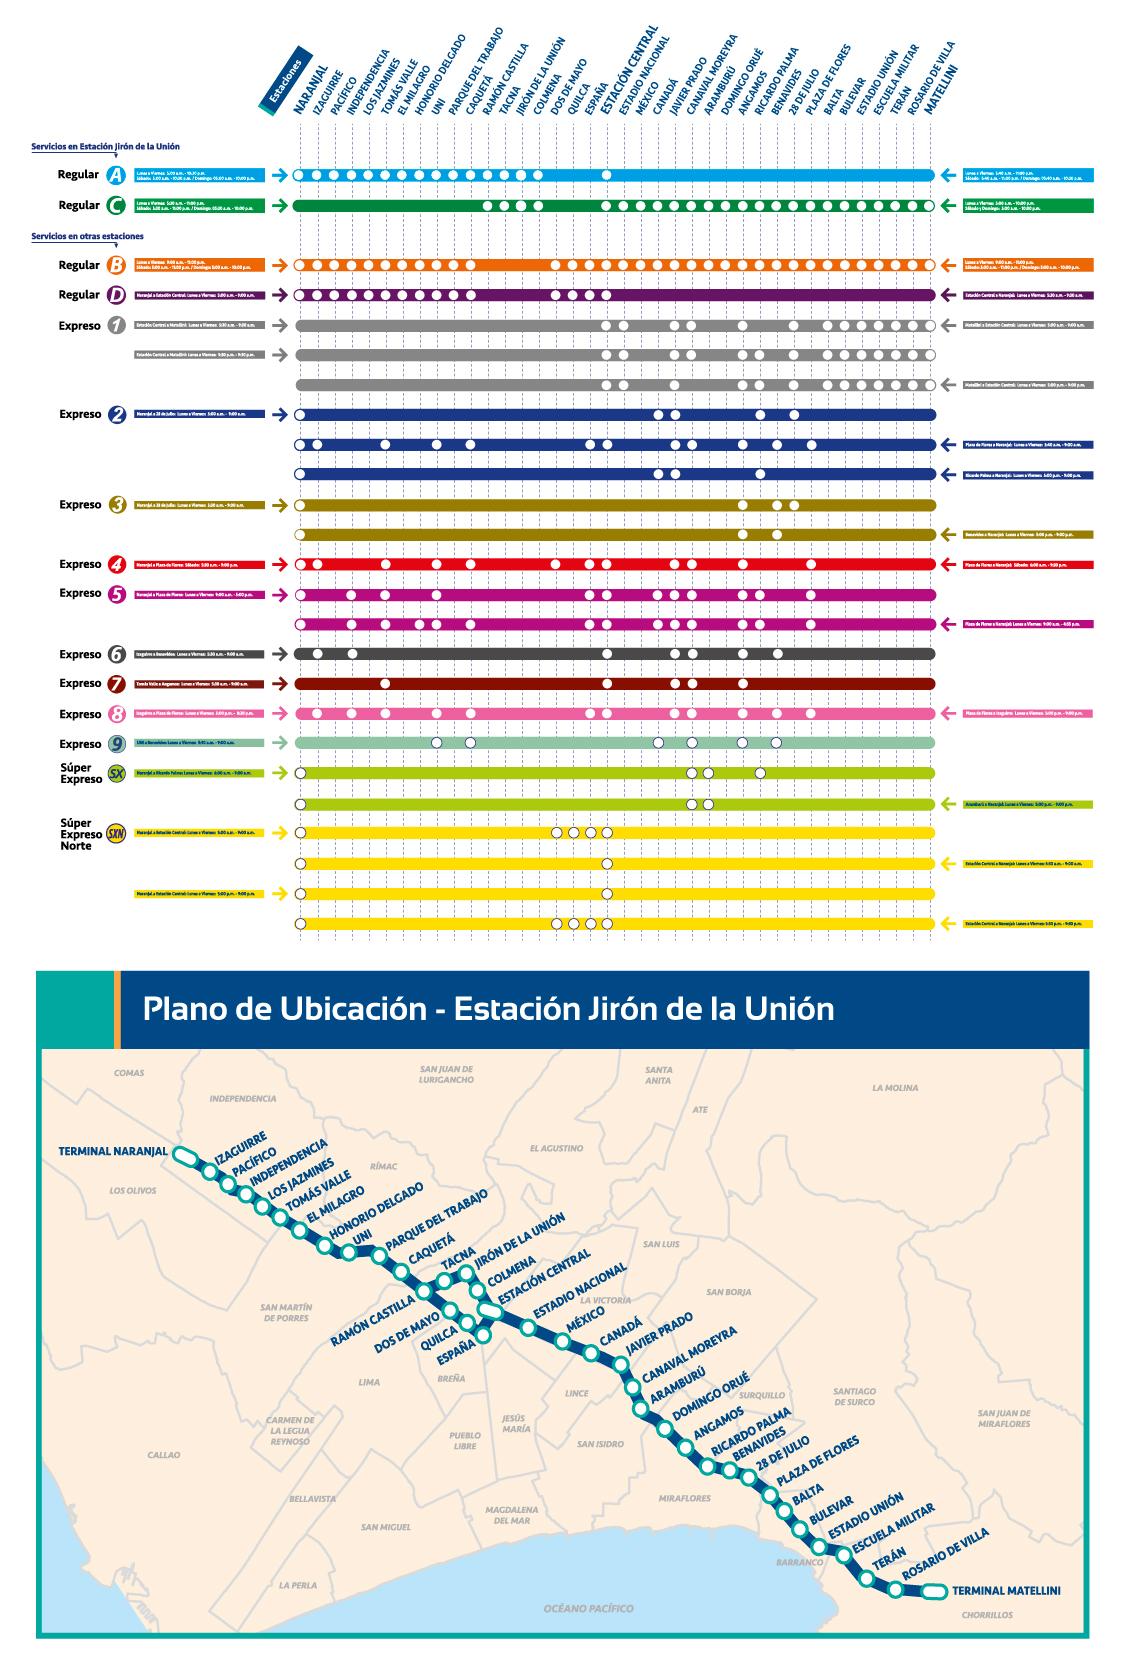 QUIPU-PIEZA-JIRON-DE-LA-UNION-CARTILLA-MAPA-FIN-CORREGIDO-CURVAS